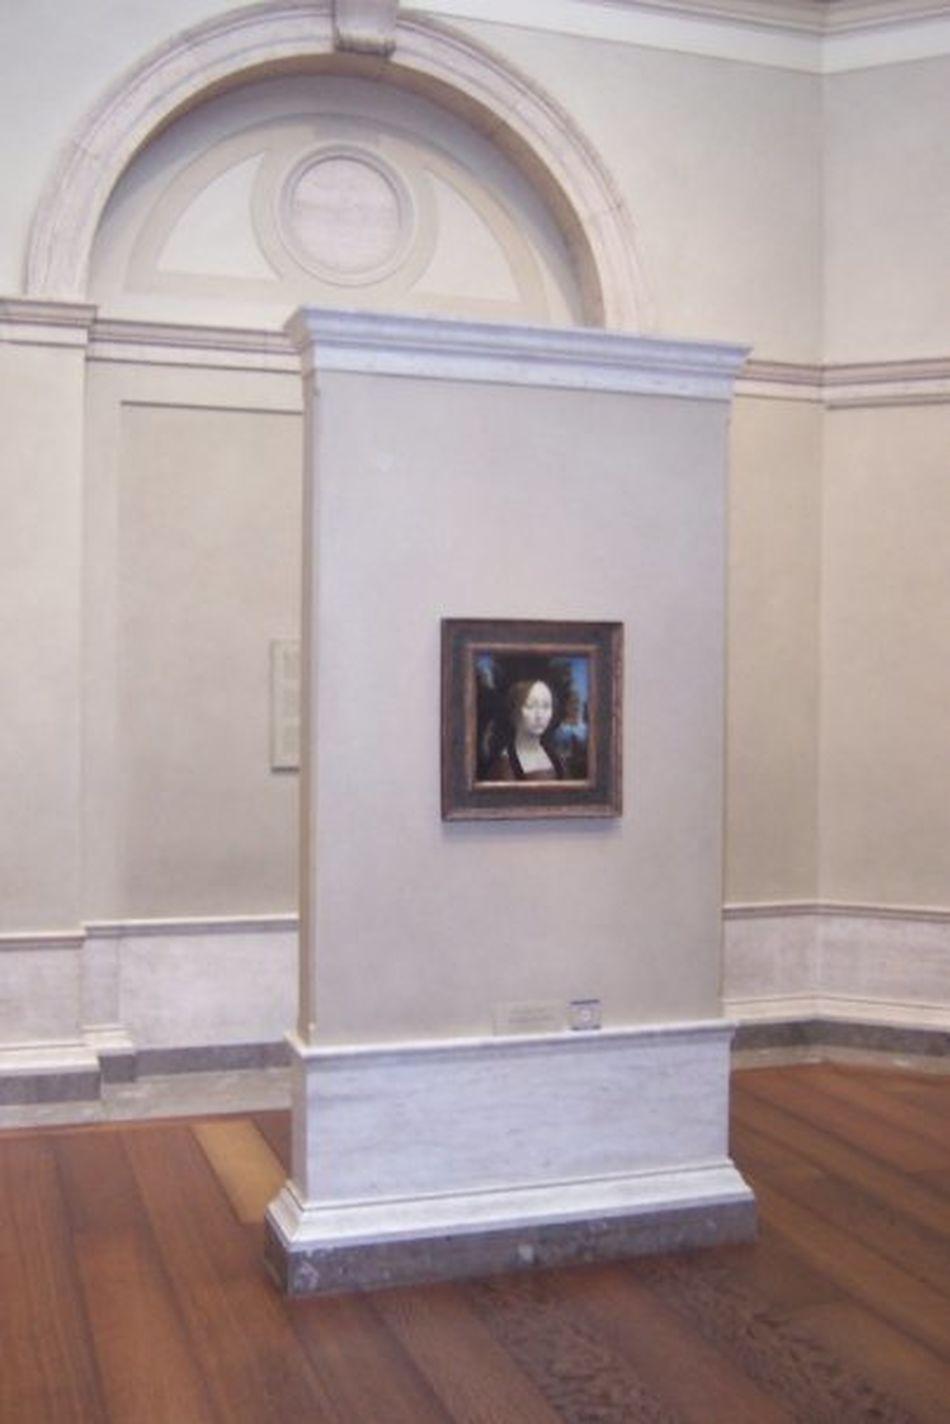 1474 - 1478 Florentine School Ginevra De' Benci Indoors  Leonardo Da Vinci National Gallery Of Art National Gallery Of Art, Washington DC Portrait, Female Washington DC